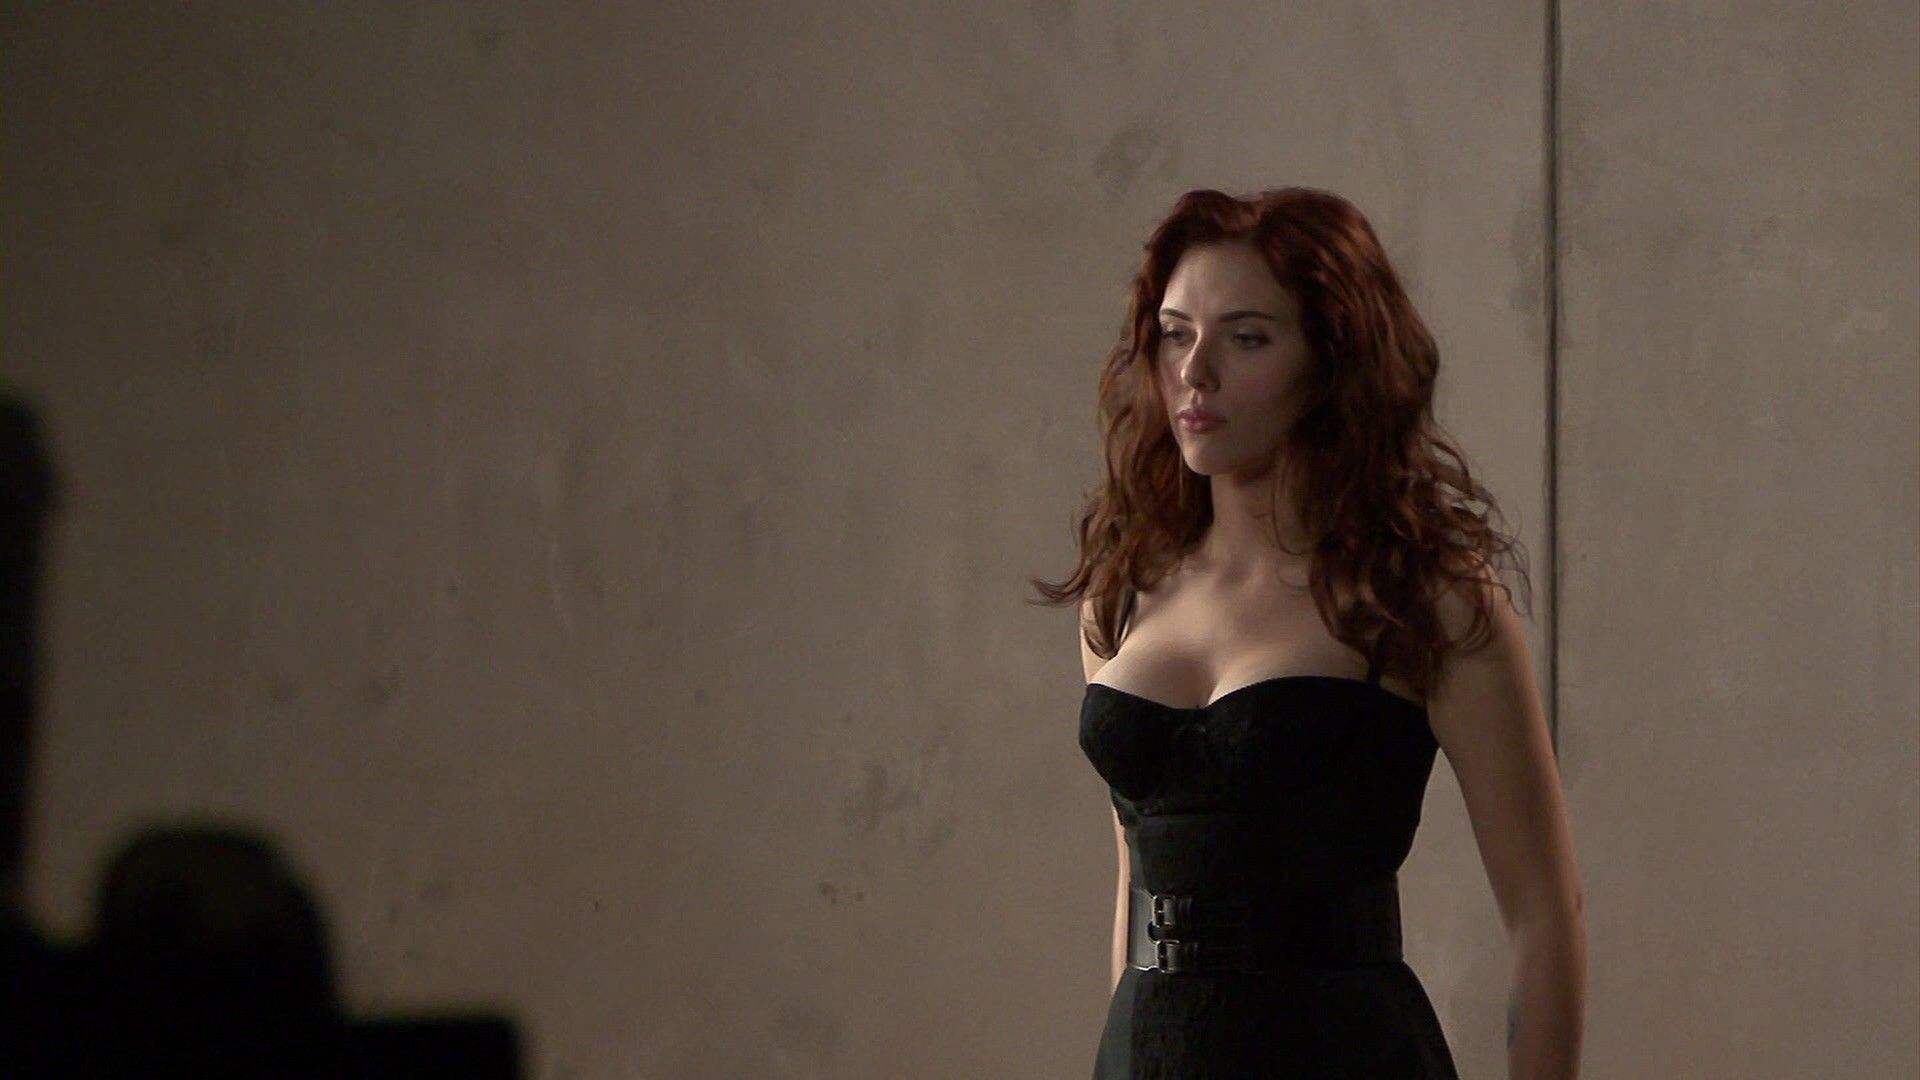 Pin By Jason Bowen On Scarlett Johansson Iron Man 2 Movie